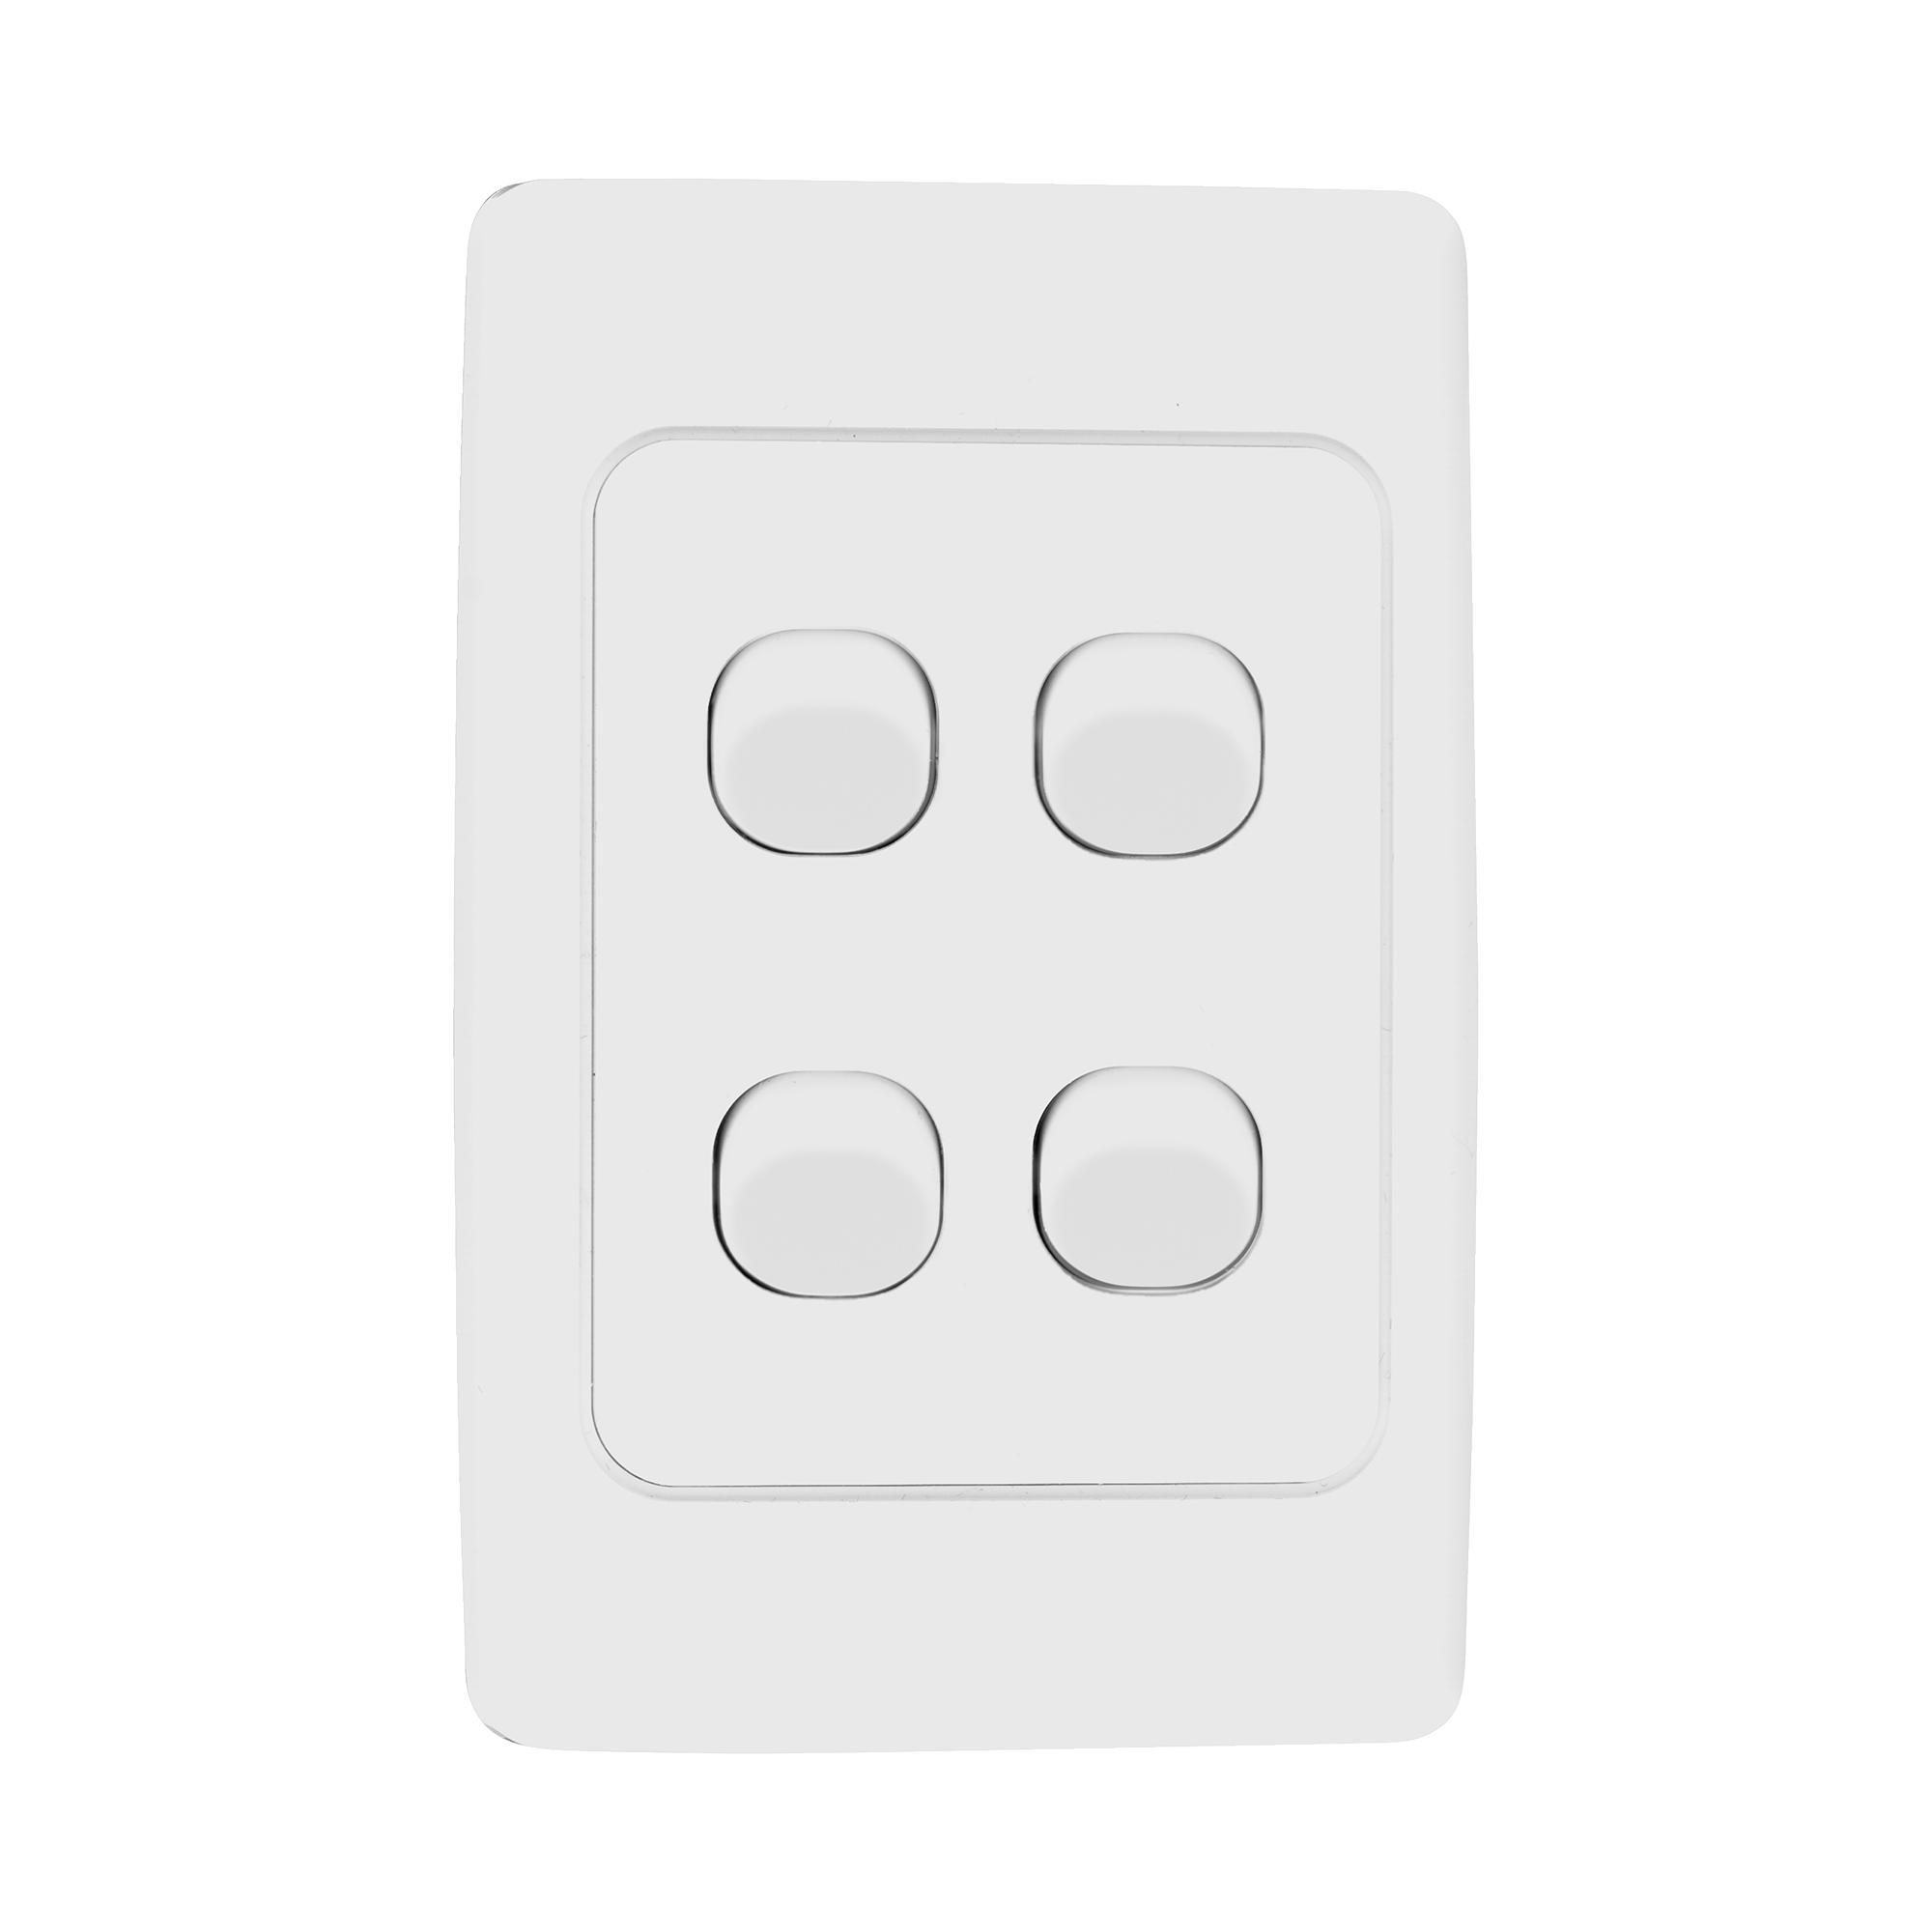 Deta quad vertical switch